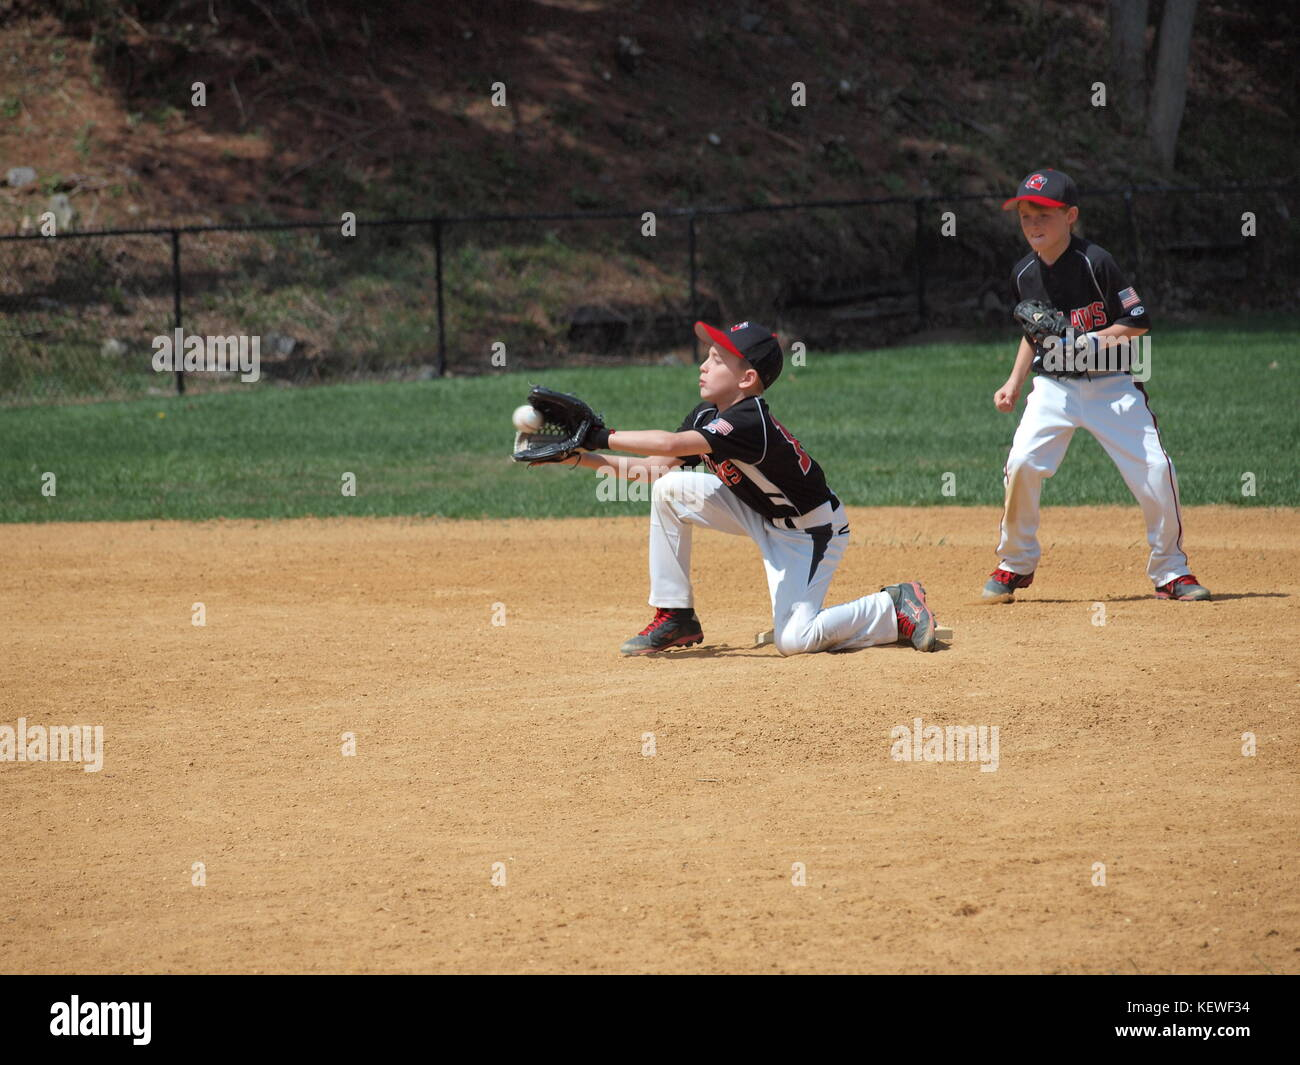 Little League fielder stopping ball during hot summer day. Stock Photo